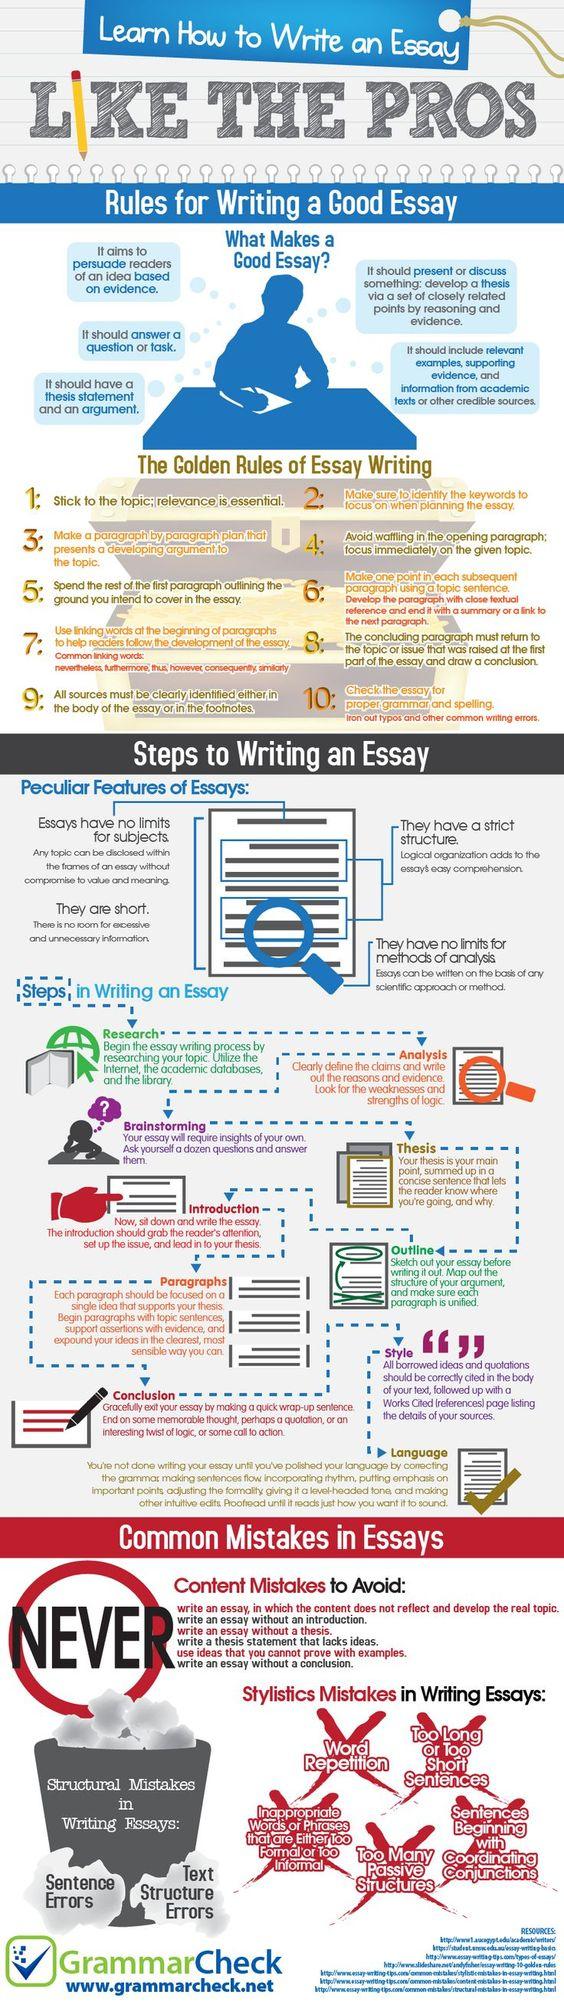 write my custom custom essay on lincoln short cinderella essay i bar advisor bar exam essay tips college essay mistakes ivy coach the ivy coach